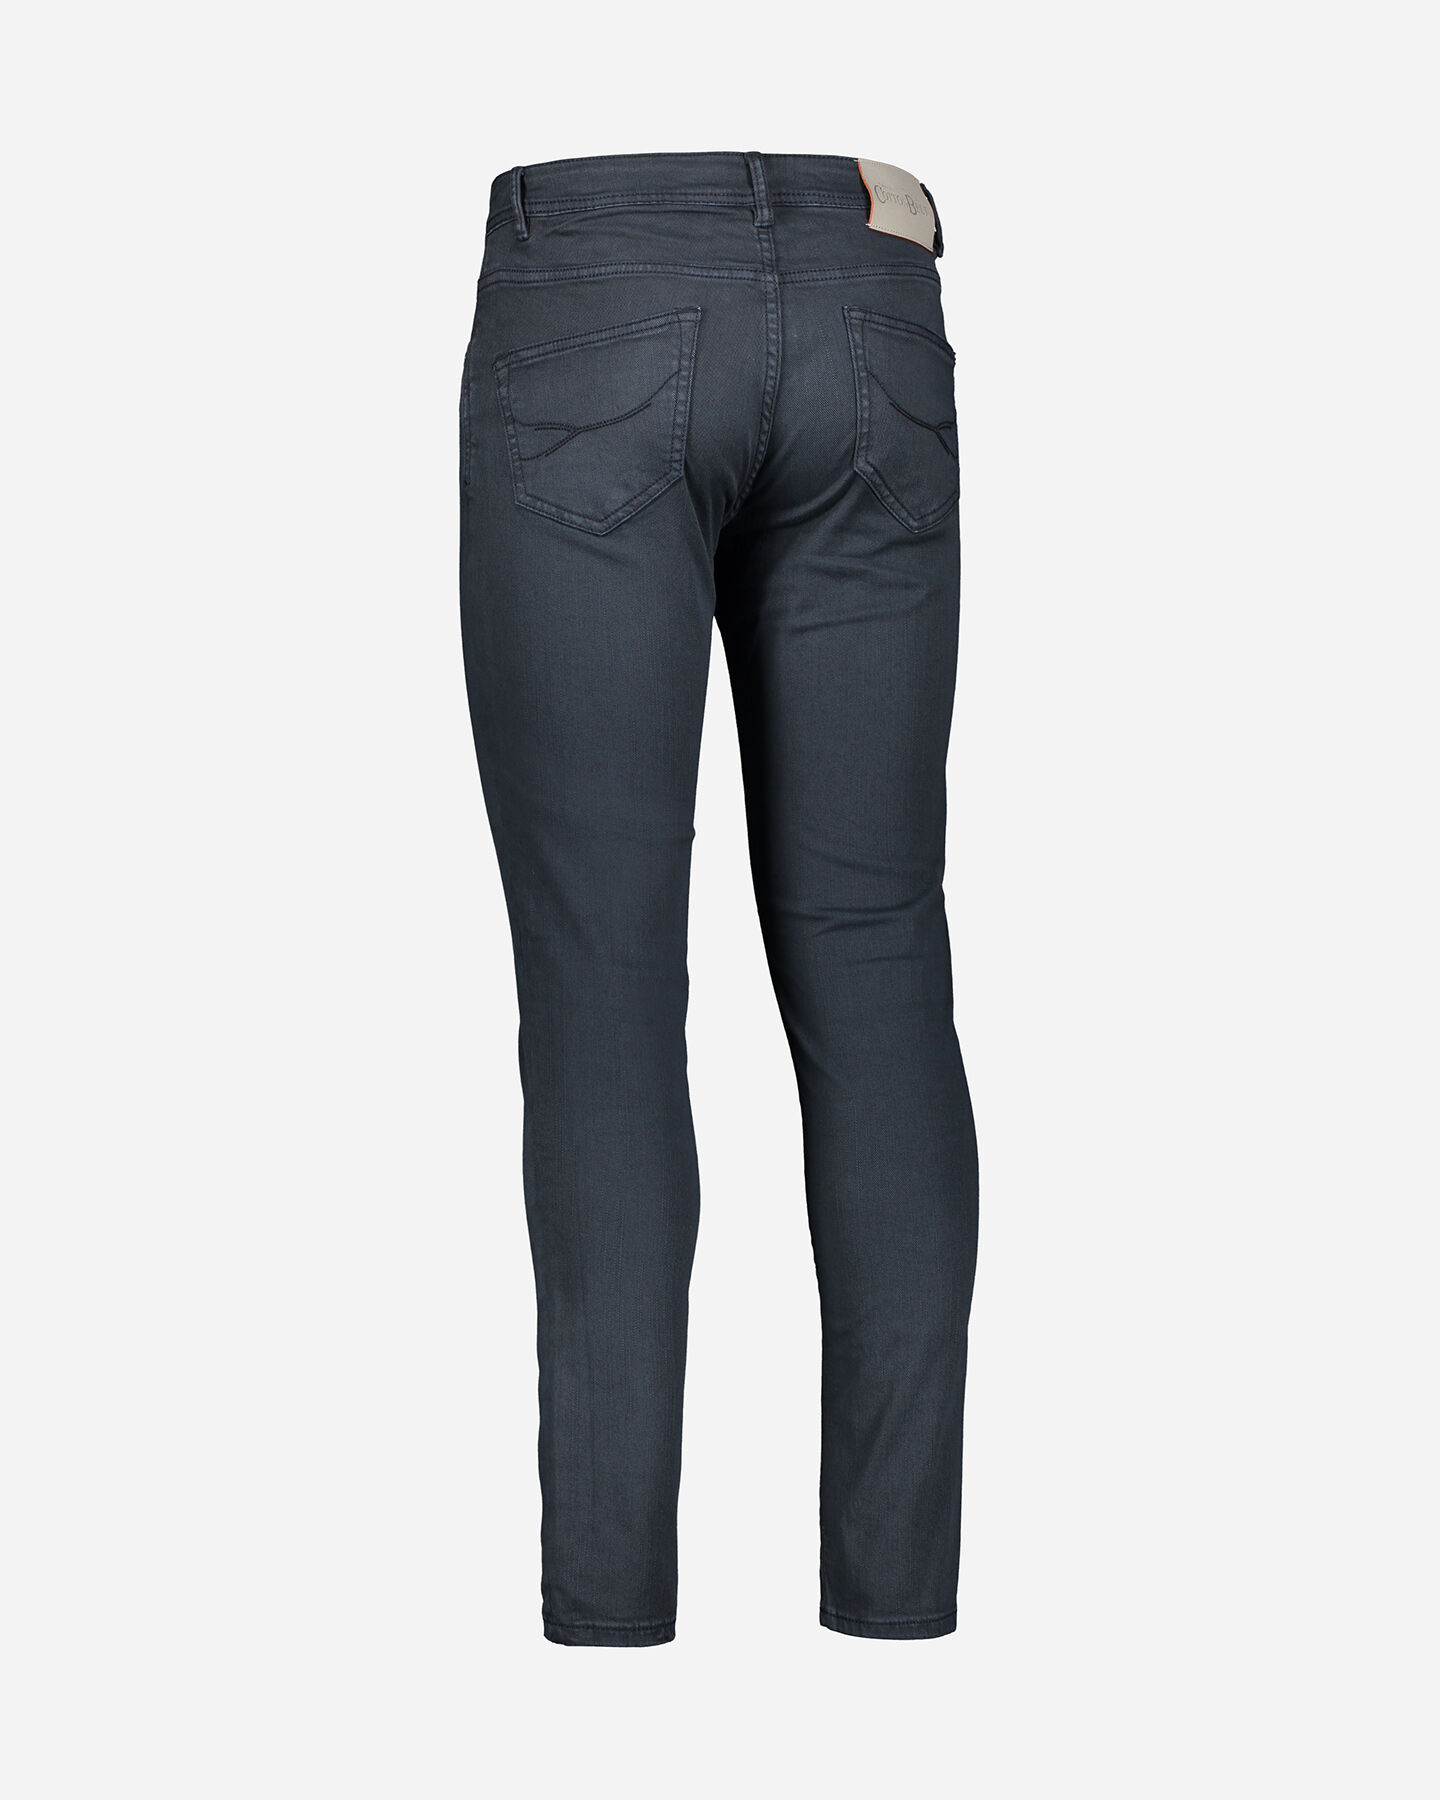 Jeans COTTON BELT 5T HAMILTON SLIM M S4070907 scatto 6